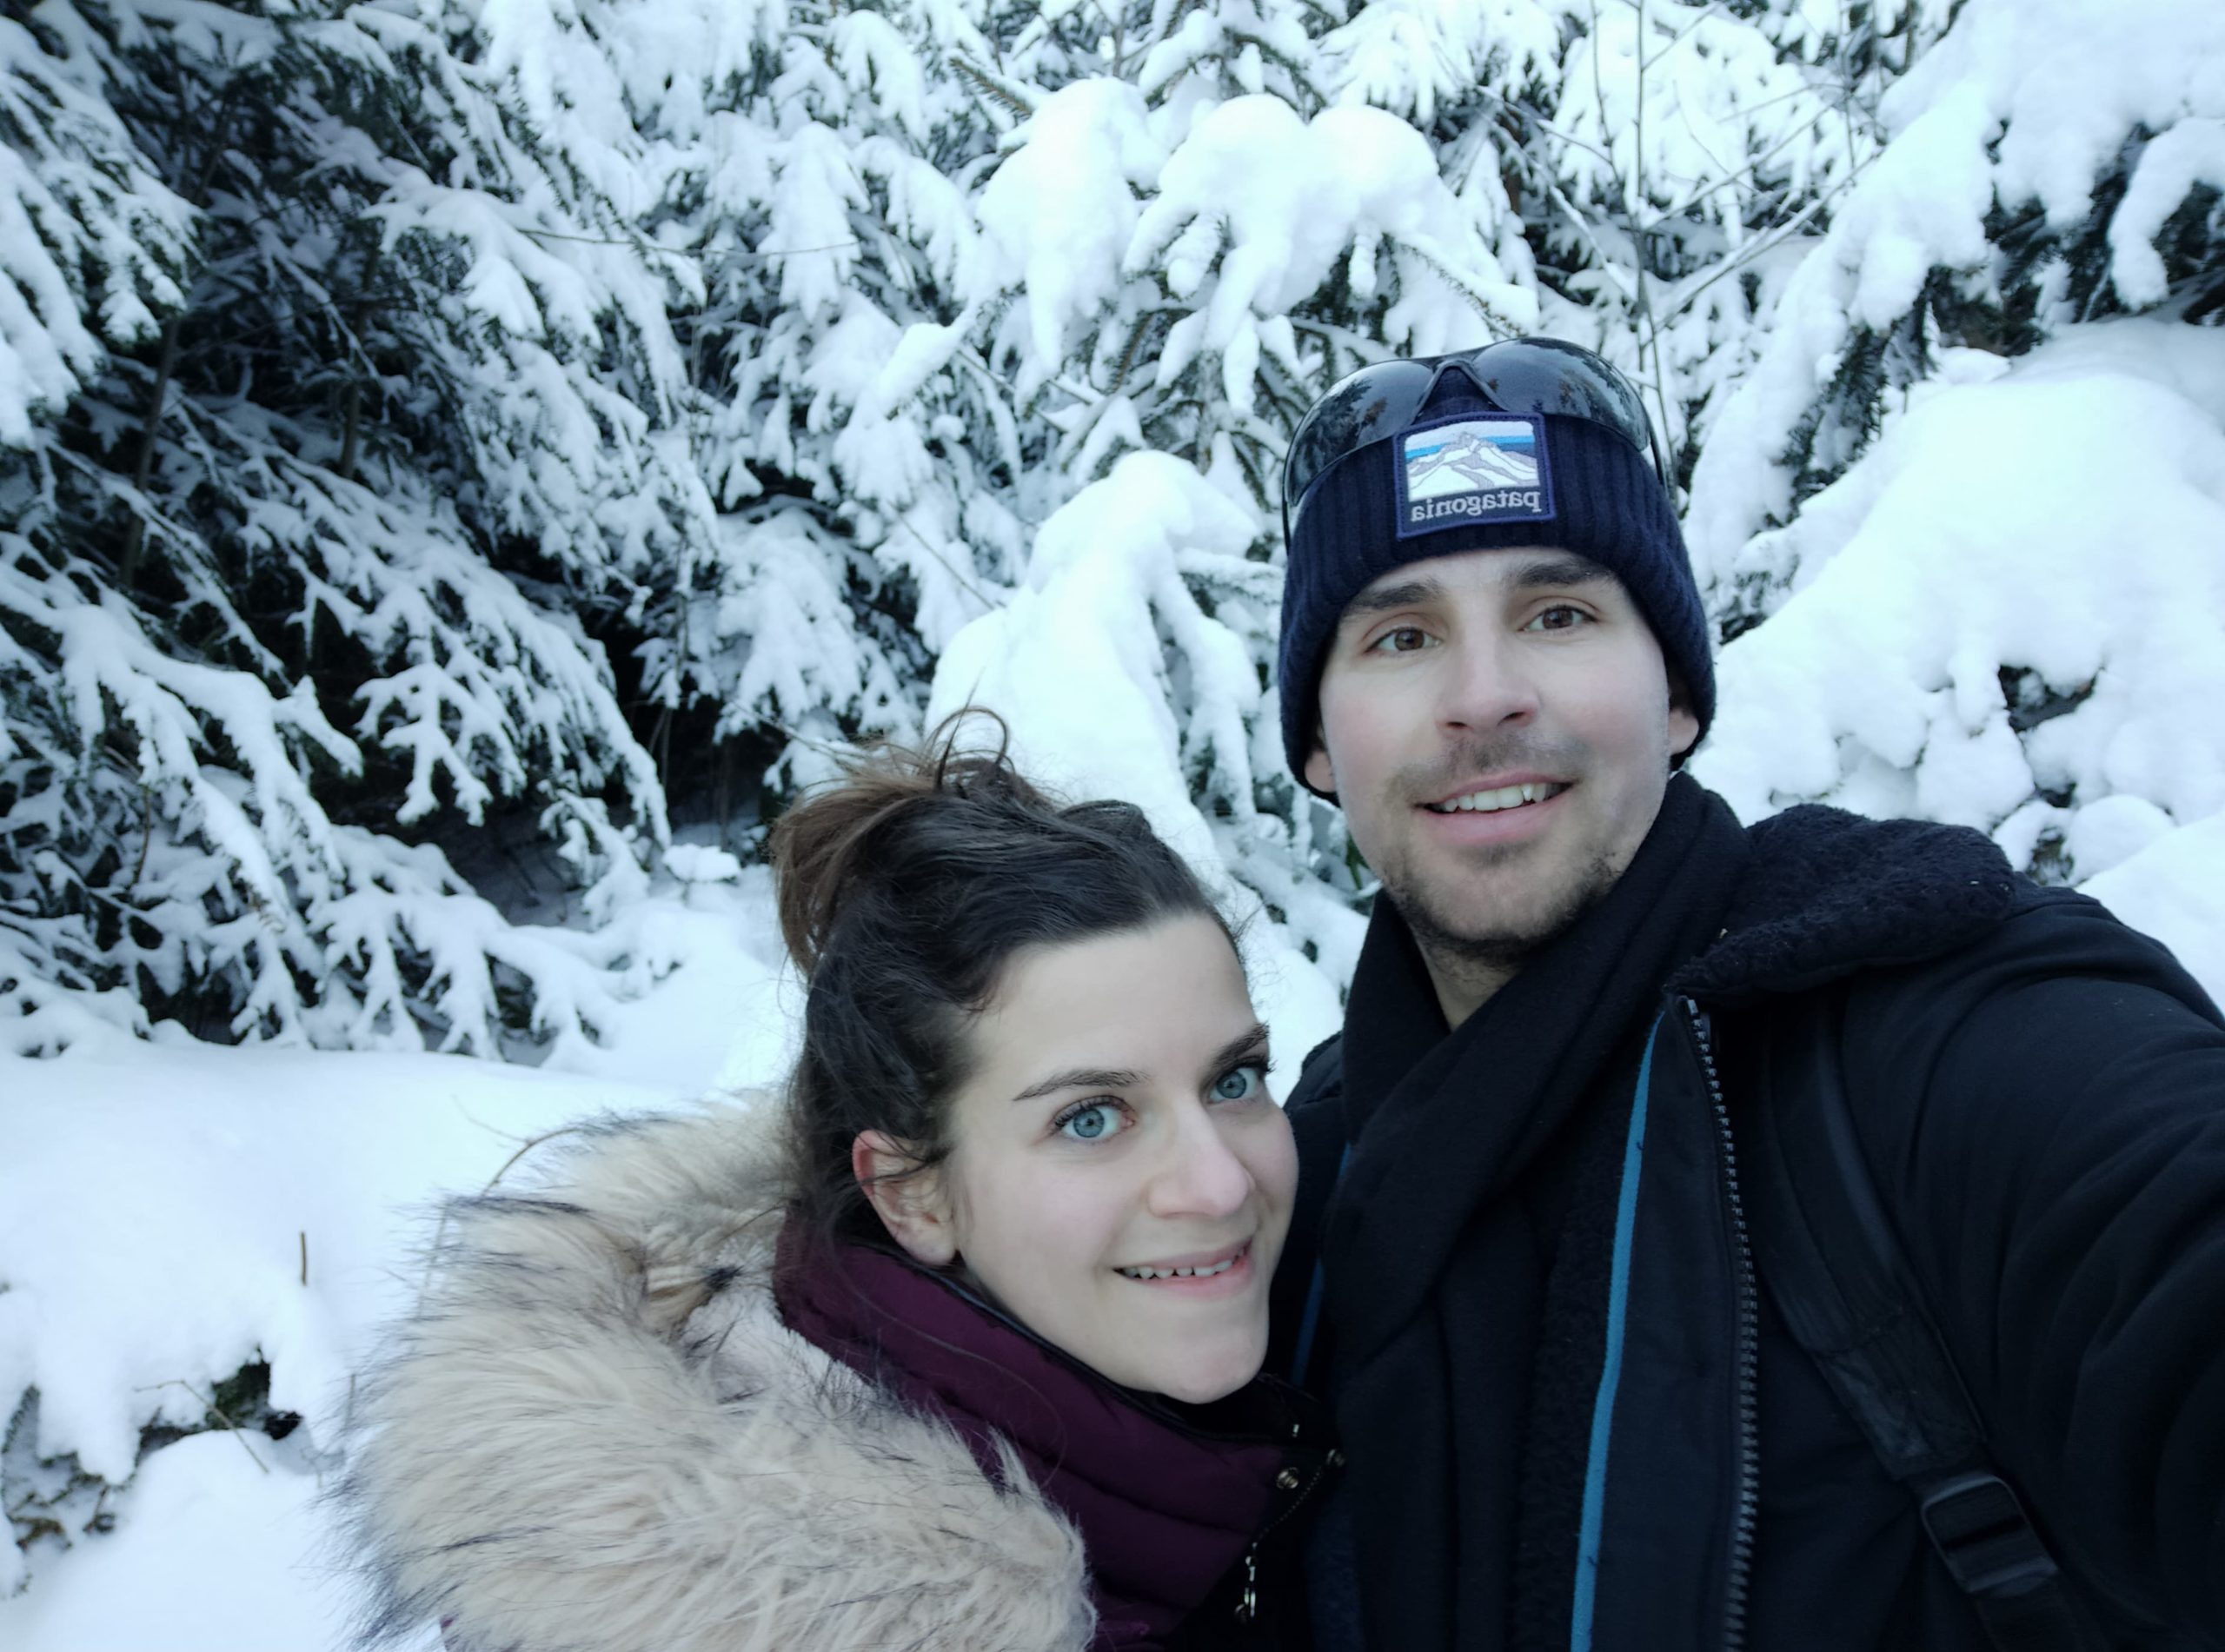 randonnée hivernale à Guggisberg parc naturel du Gantrisch